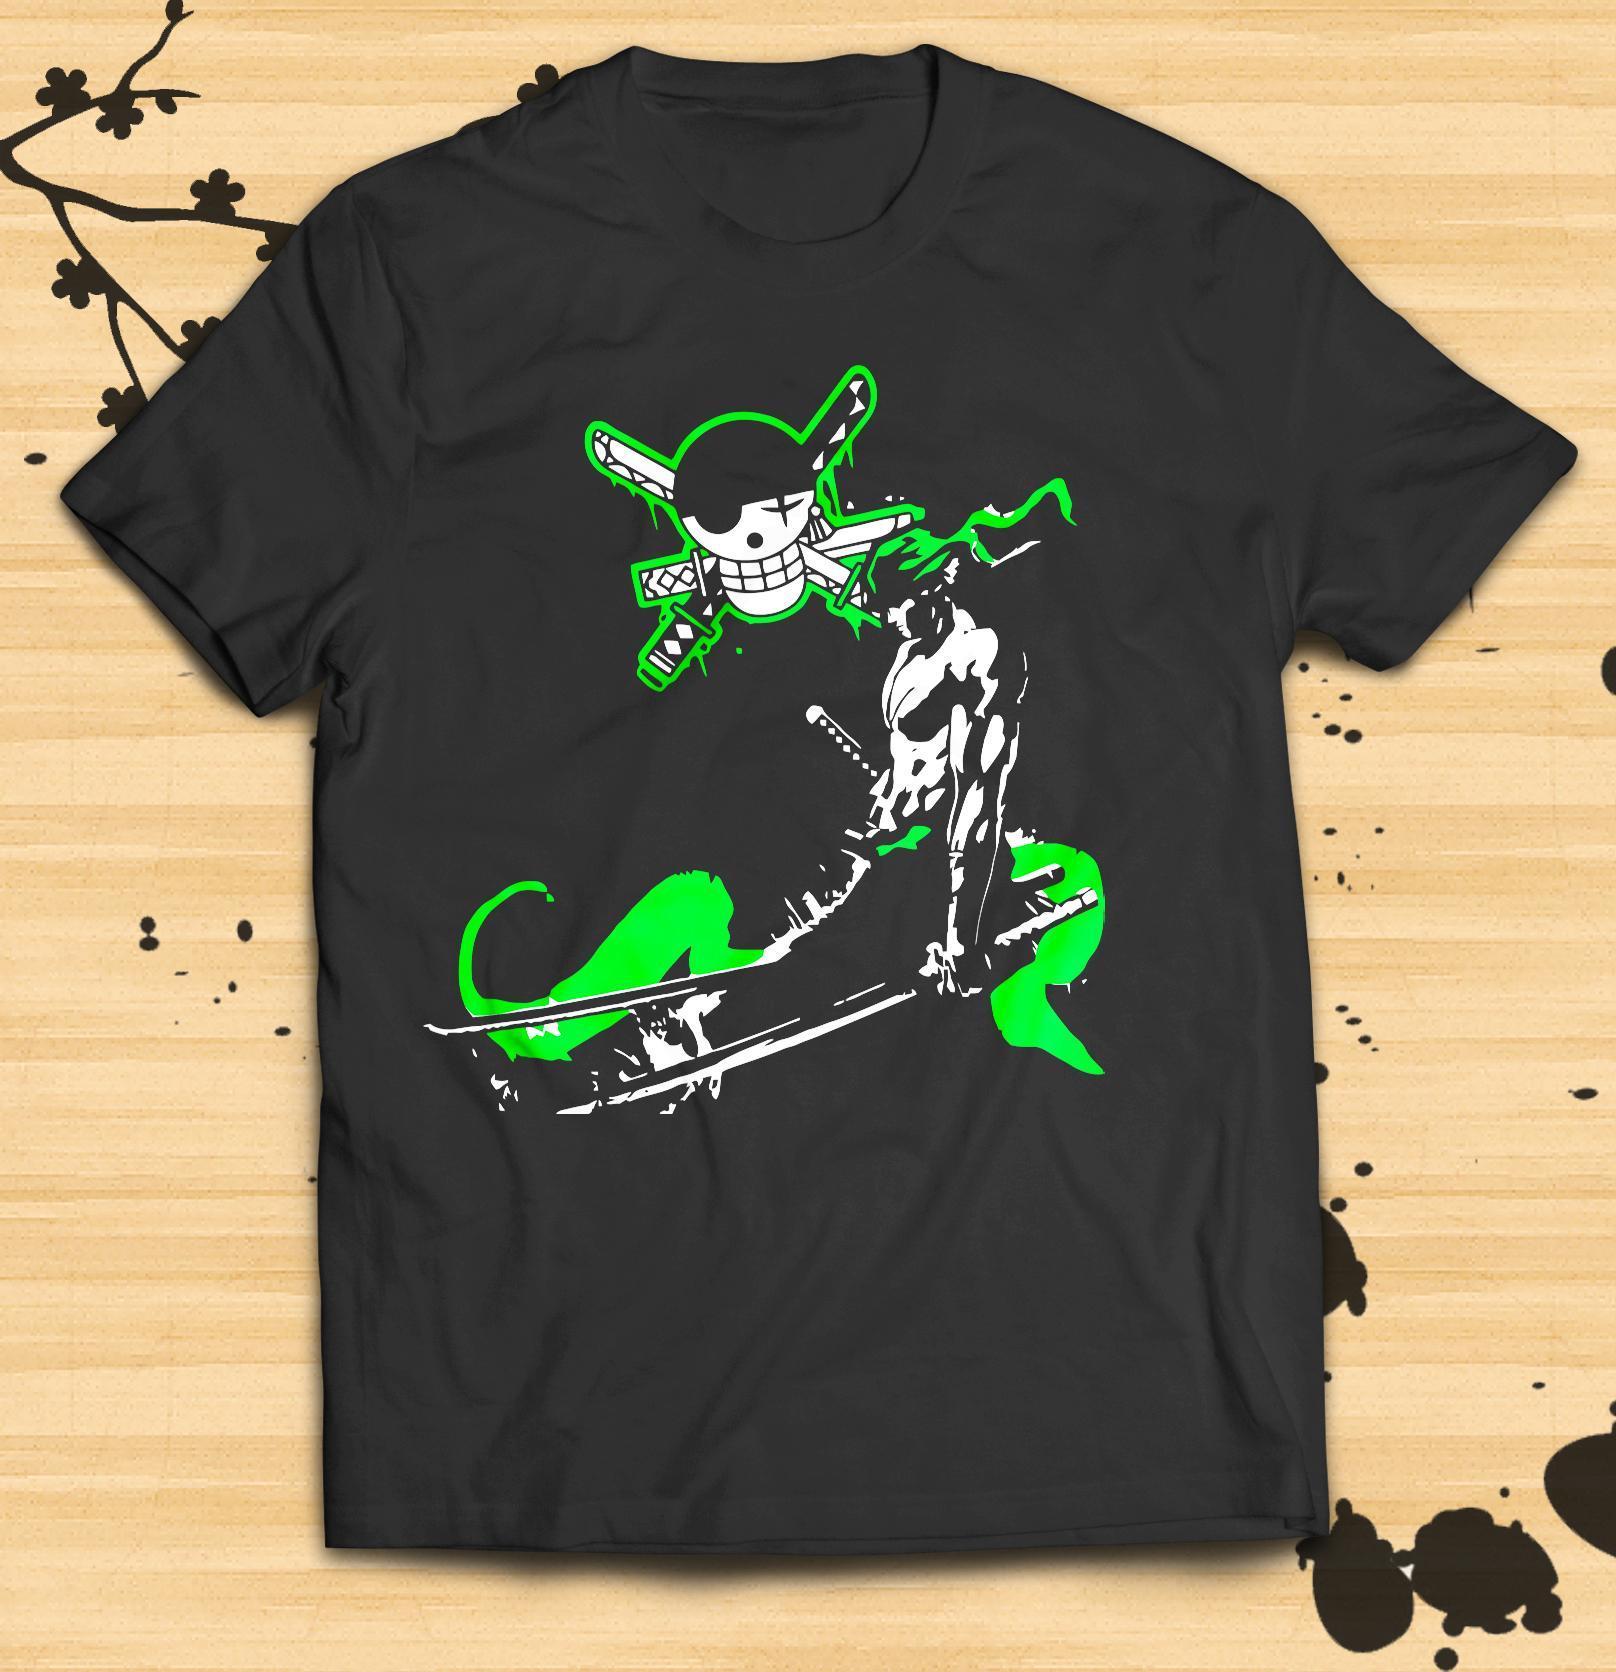 53eadbdec57a T-Shirt Clothing for Men for sale - Mens Shirt Clothing online brands